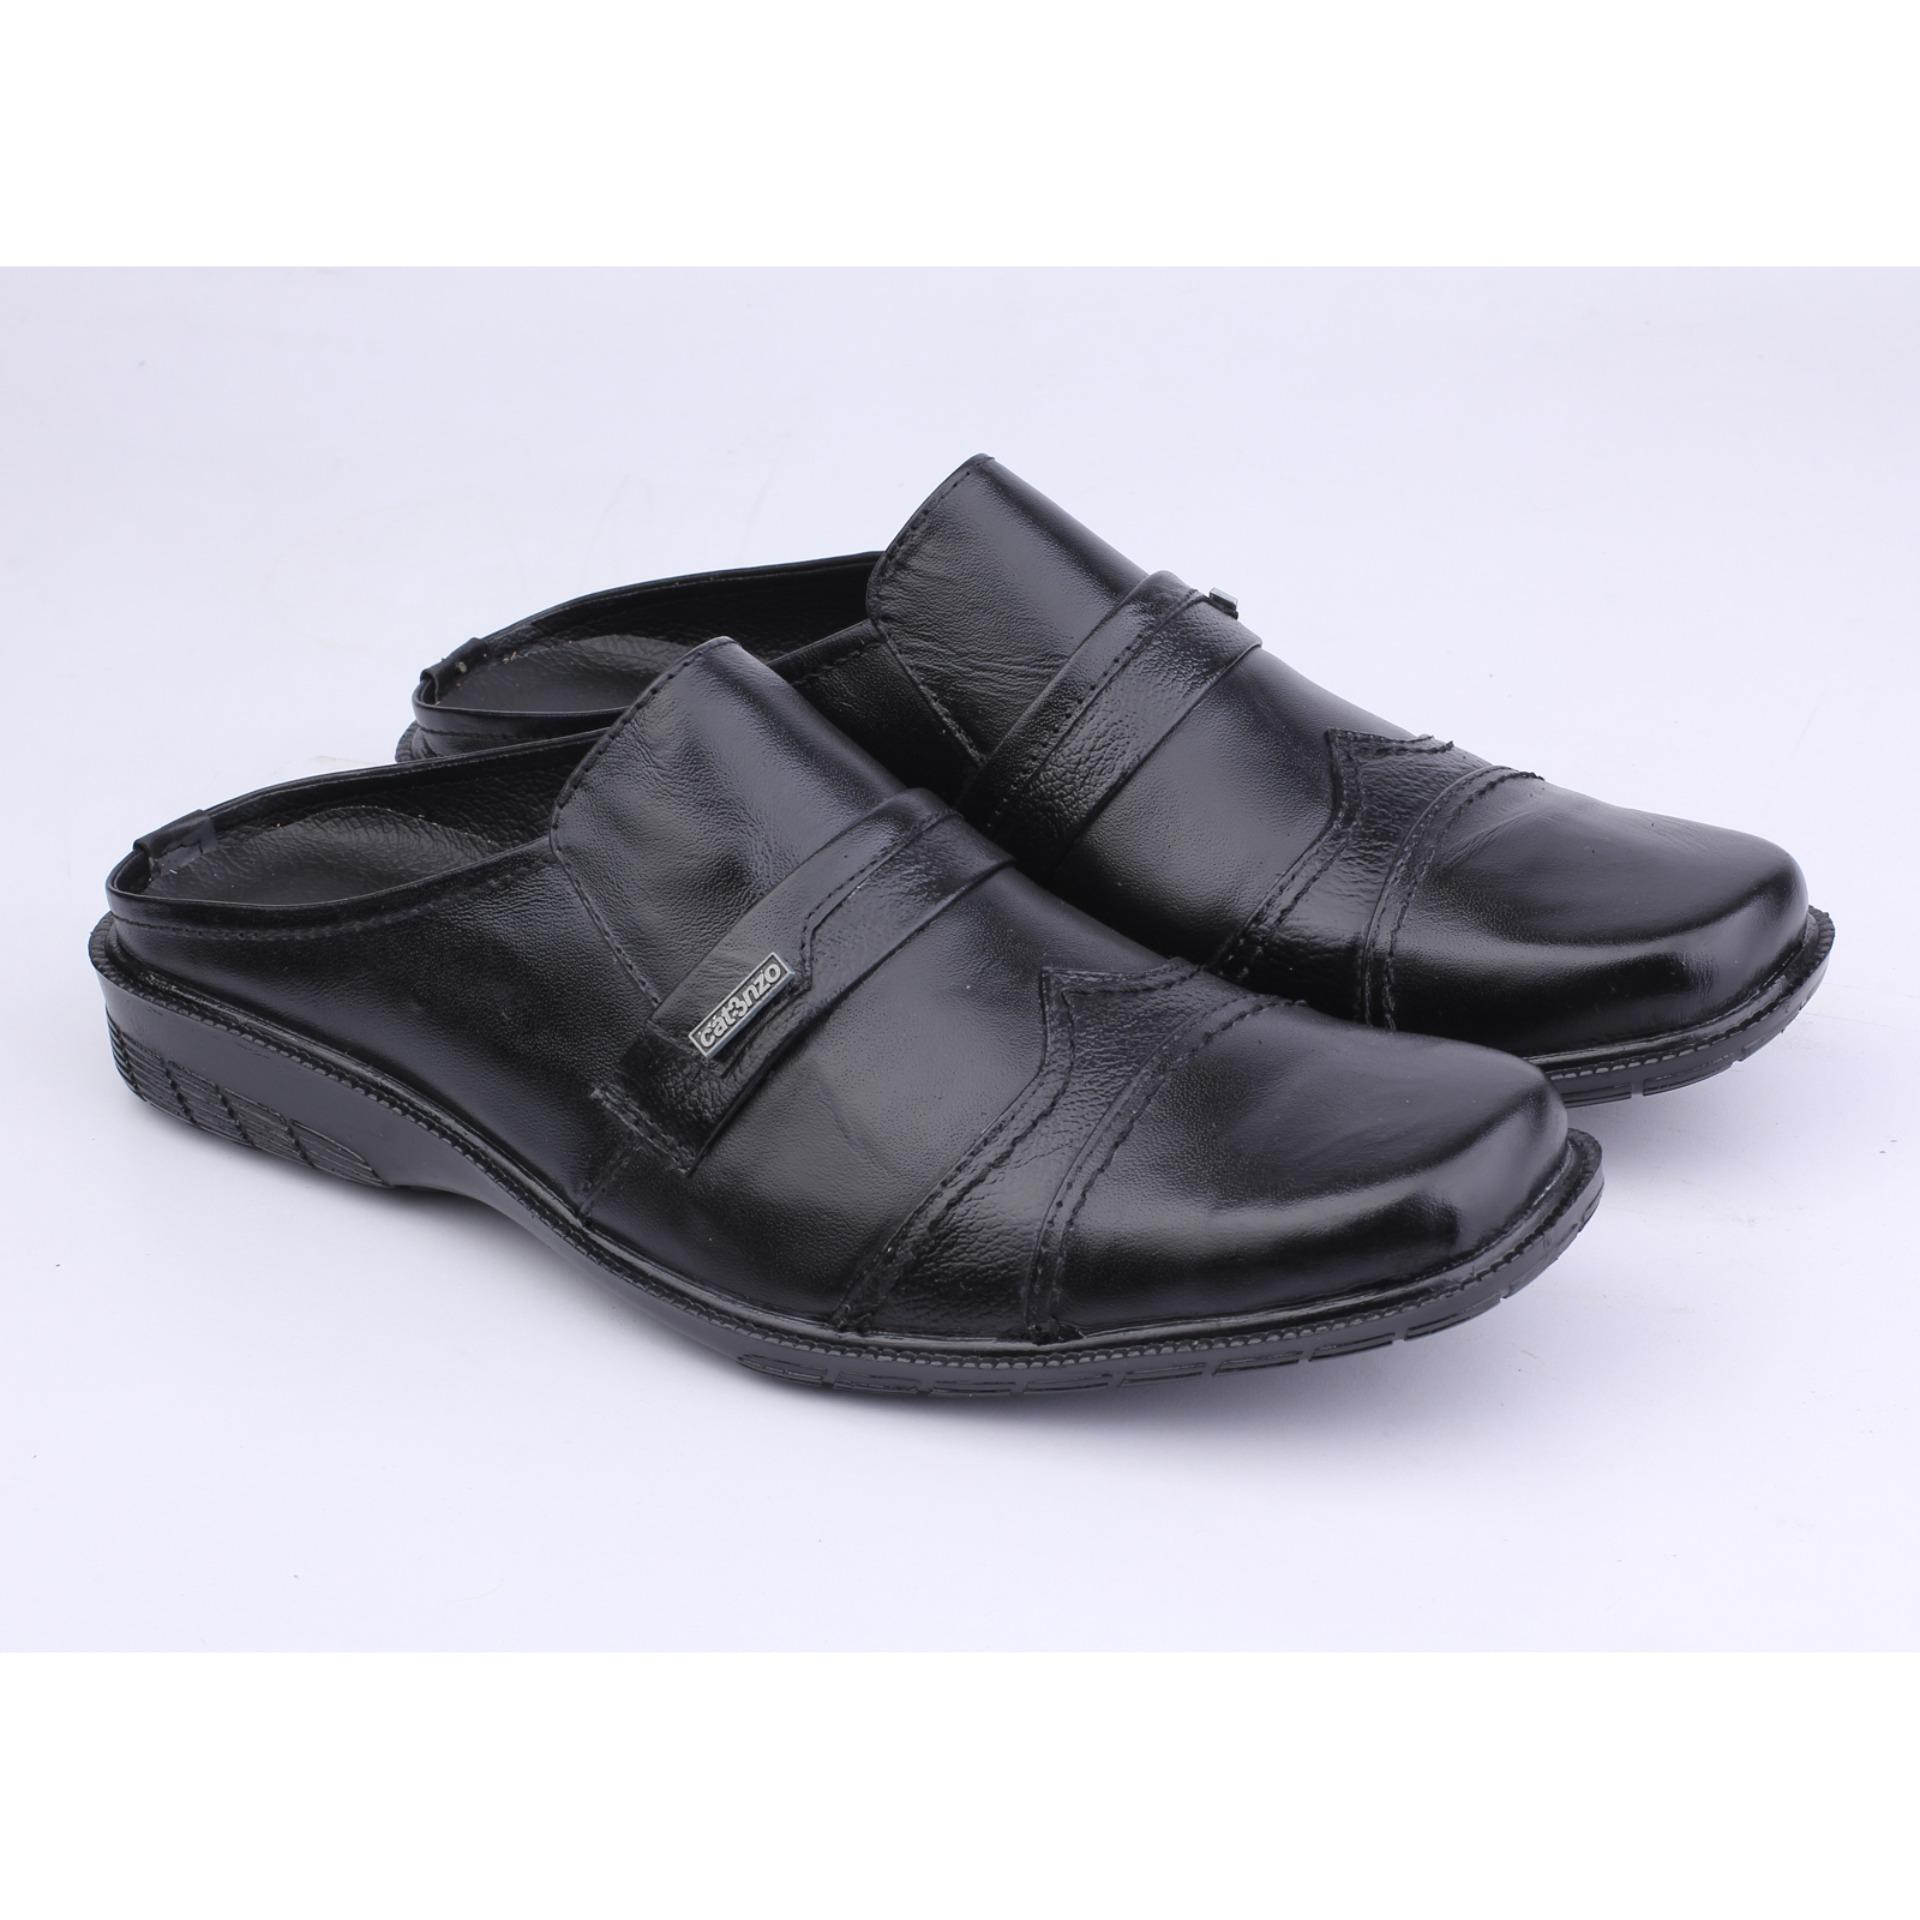 Catenzo Sandal Pantofel Kulit Pria - Sepatu Sandal YA 042 - Hitam